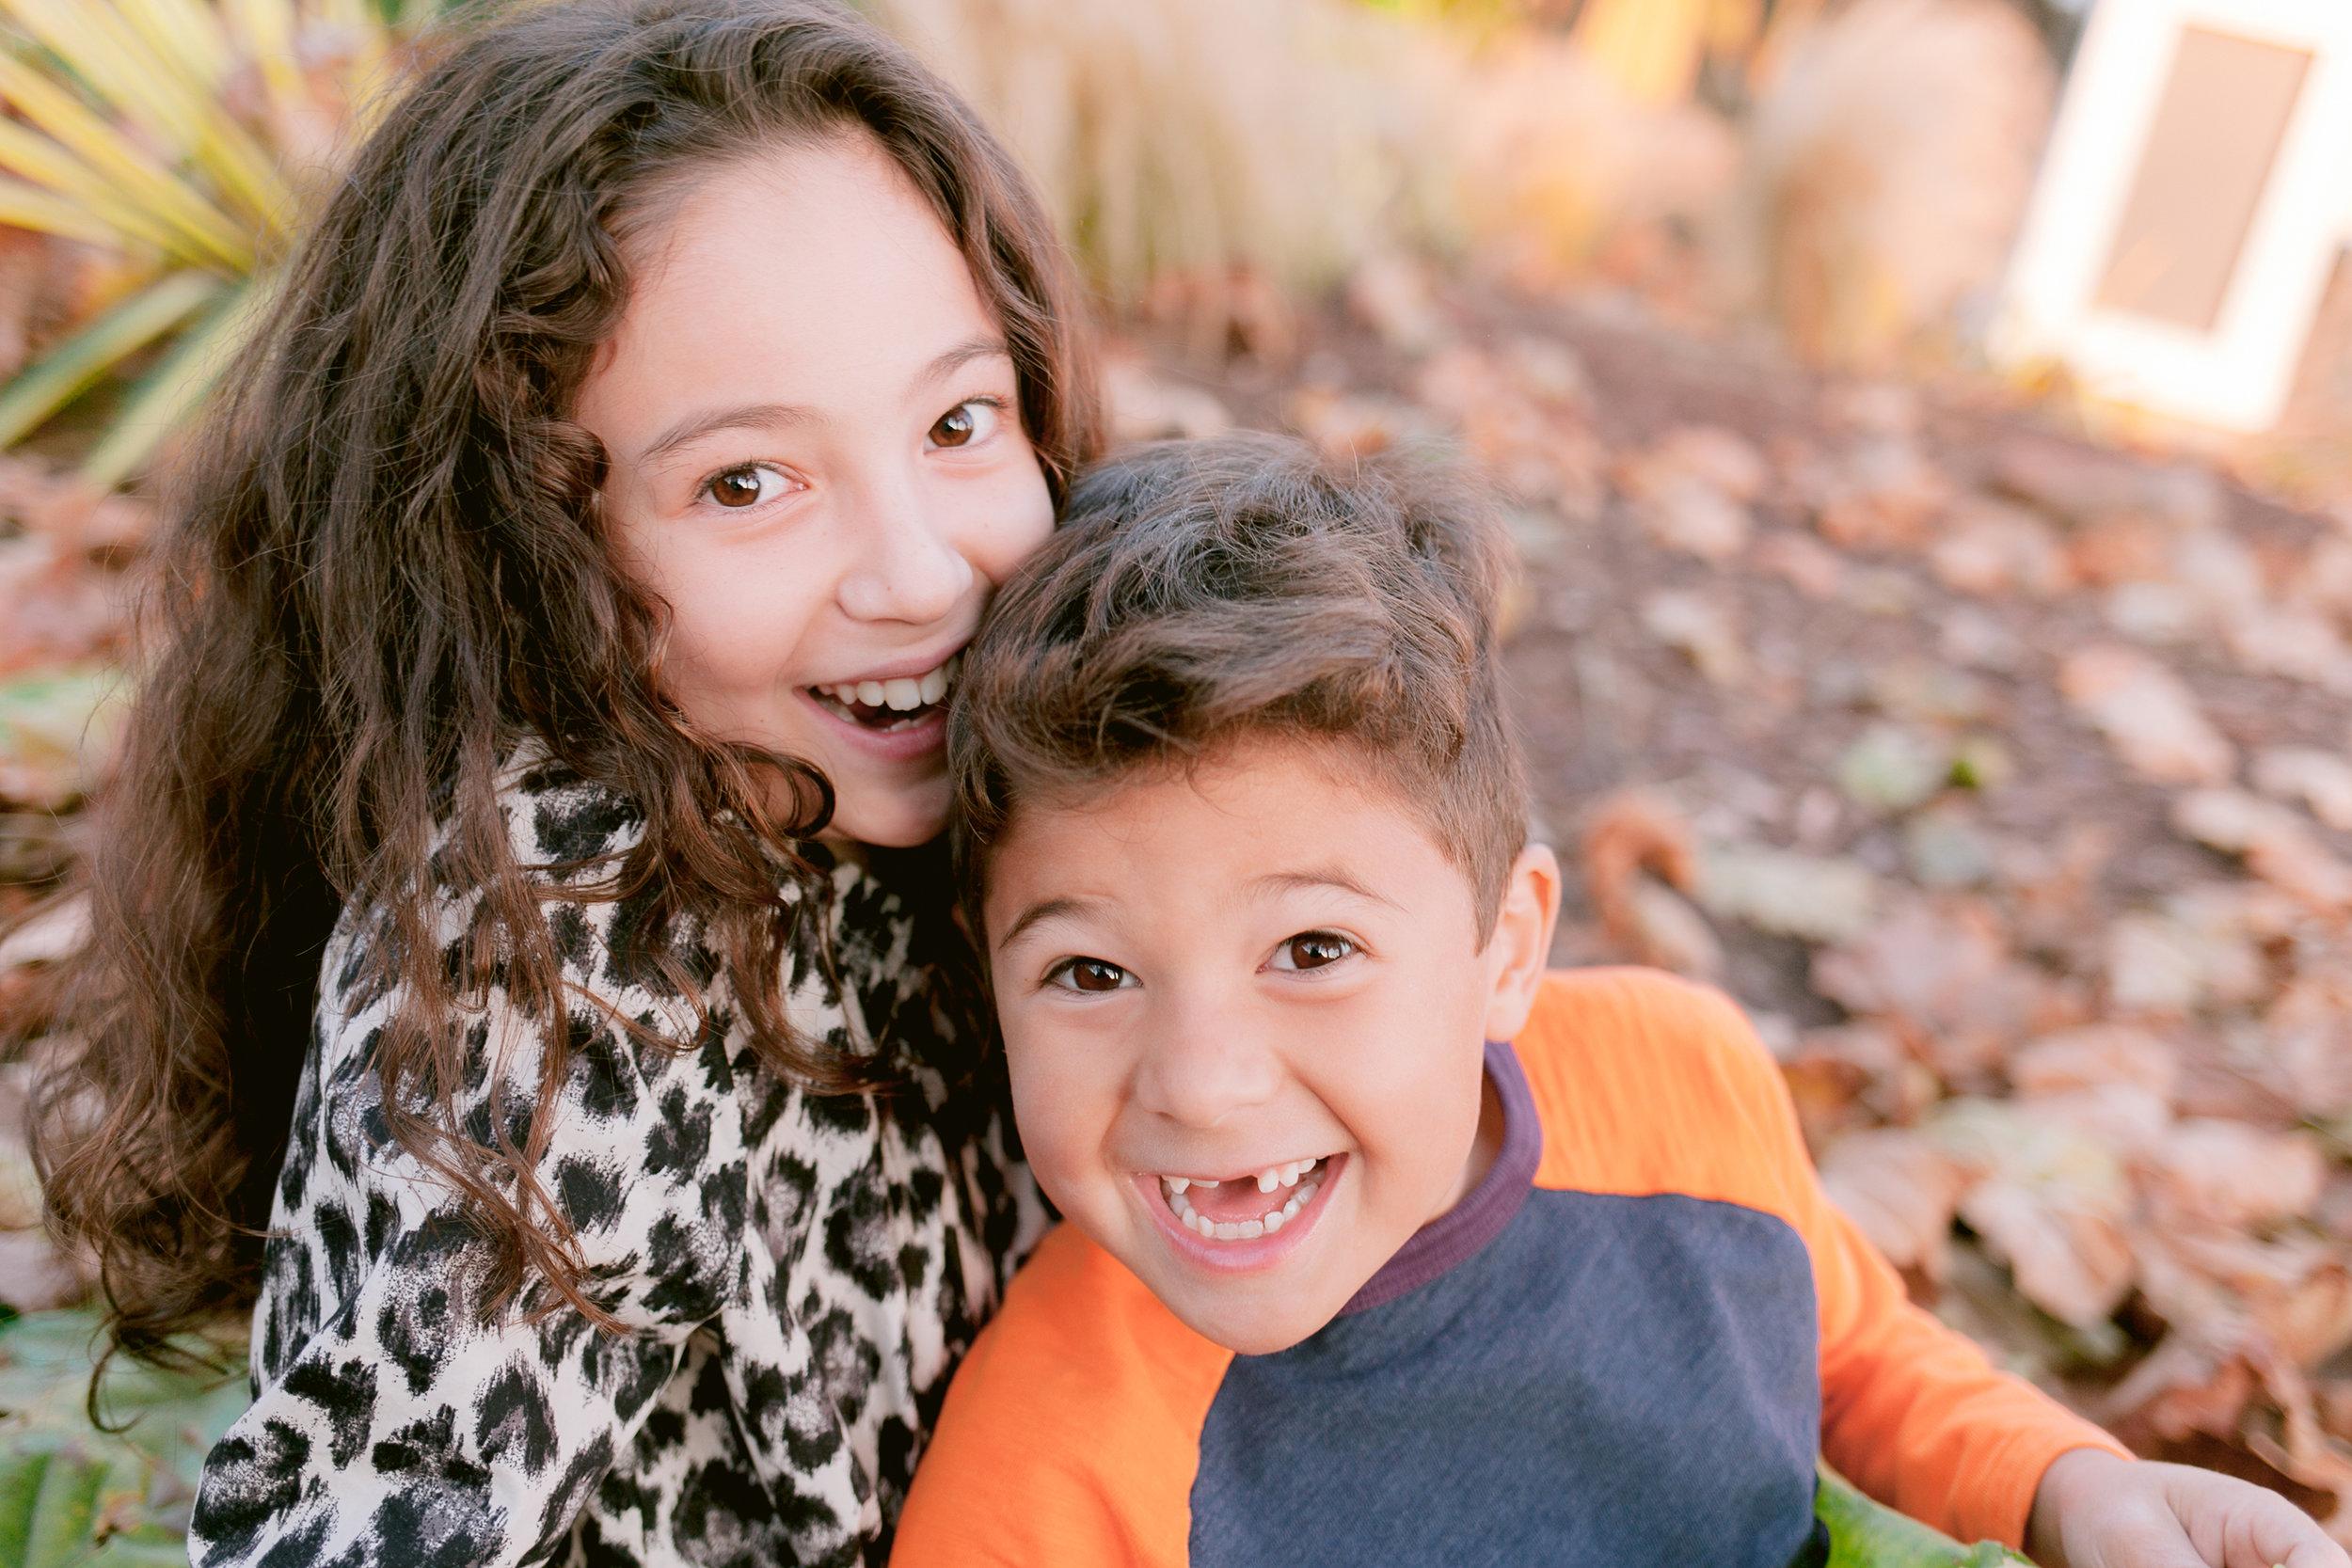 Alameda_Children_and_Family_Portrait_011.jpg